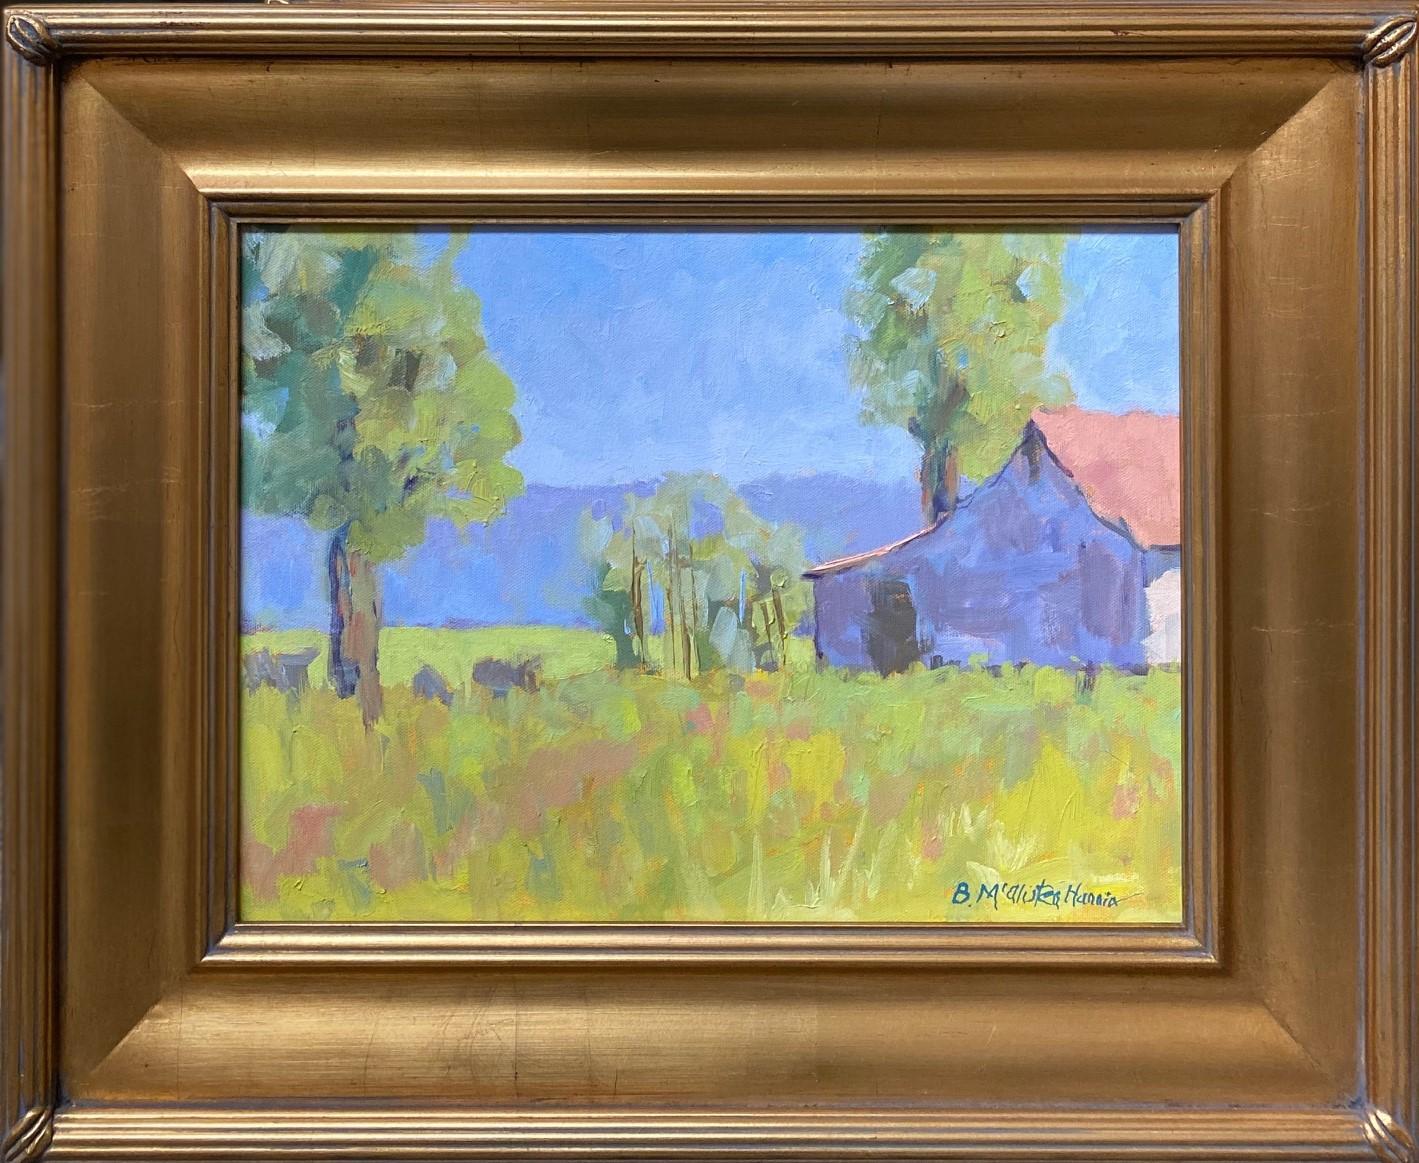 Summer Pasture, original contemporary expressionist landscape oil painting